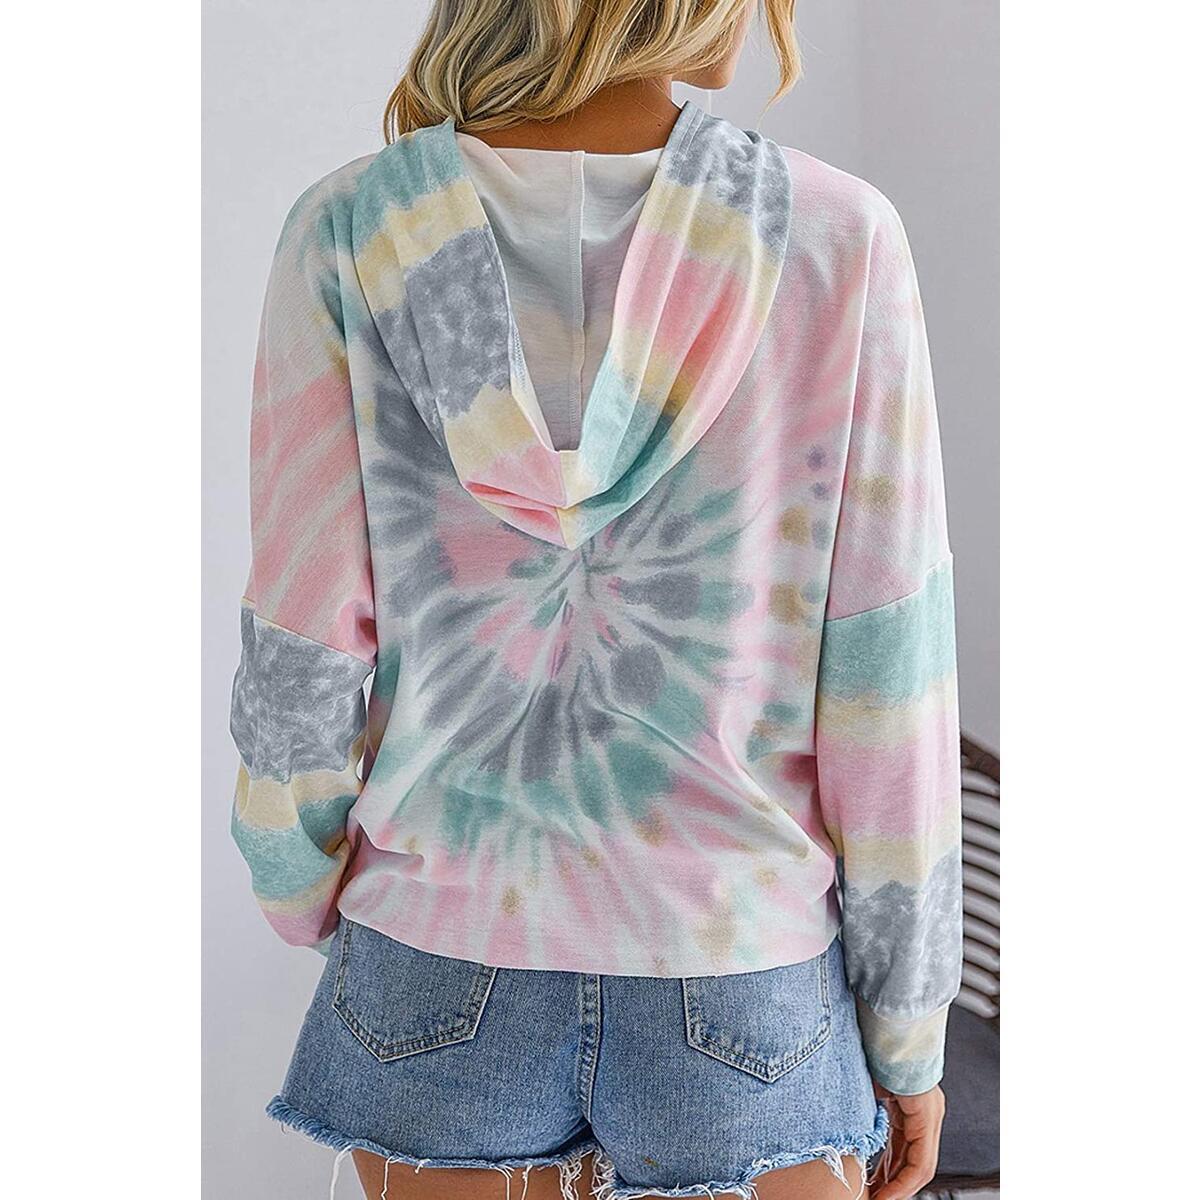 Minipeach Women's Tie Dye Sweatshirt,Long Sleeve Pajamas Lounge Pullover Soft Loose Fit Hoodie Colorblock Shirts Tops